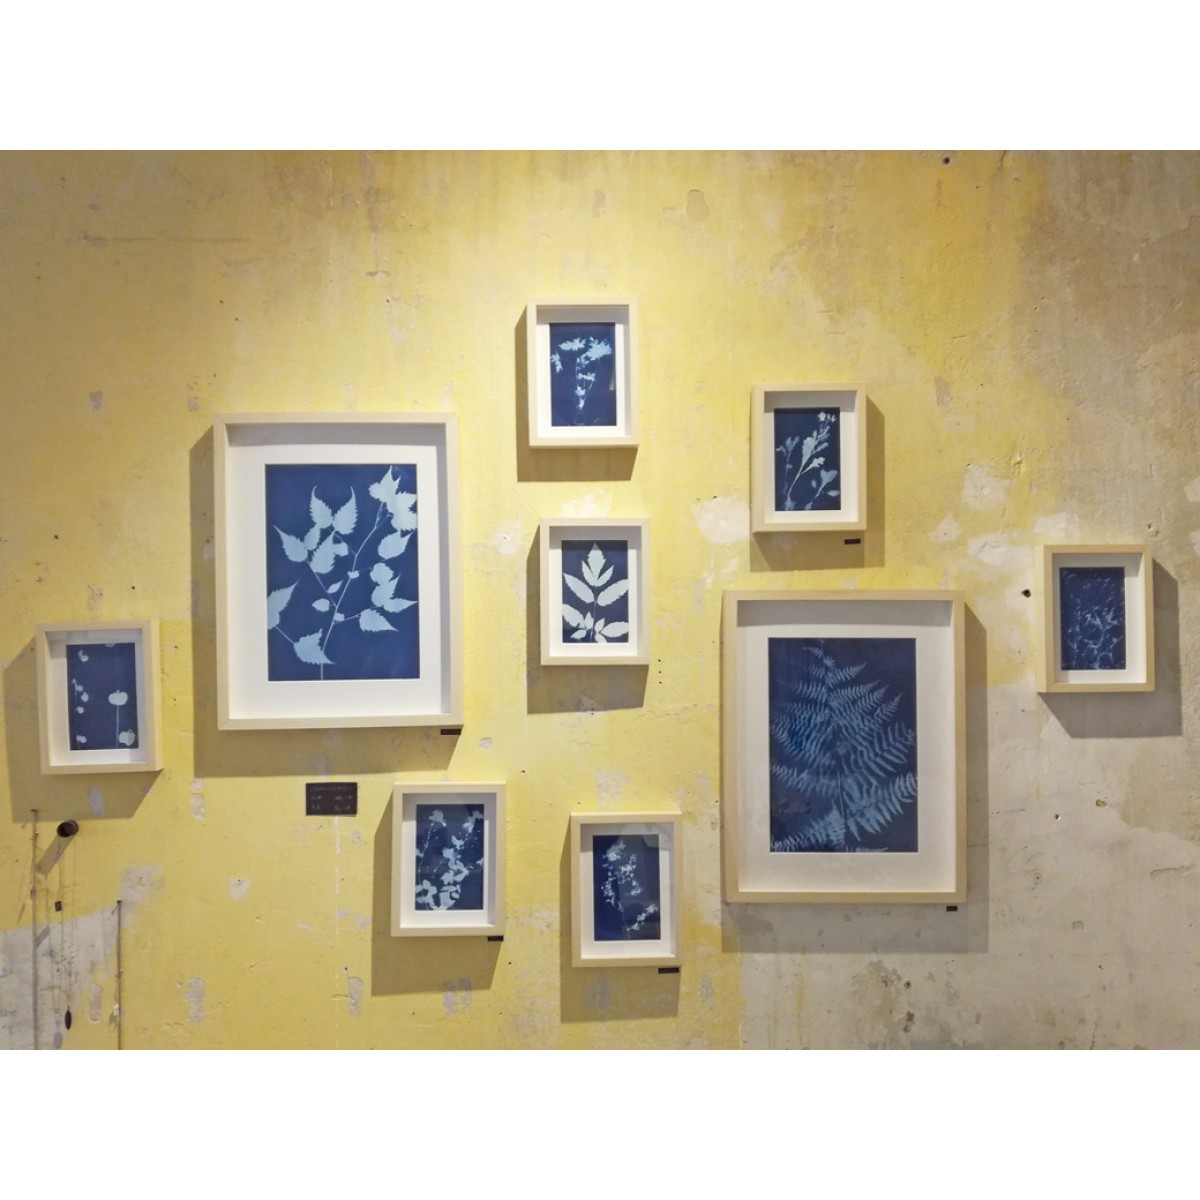 Anka Büchler, Rauke, Blaudruck,Cyanotypie, Unikat, A6, gerahmt, Motiv 12